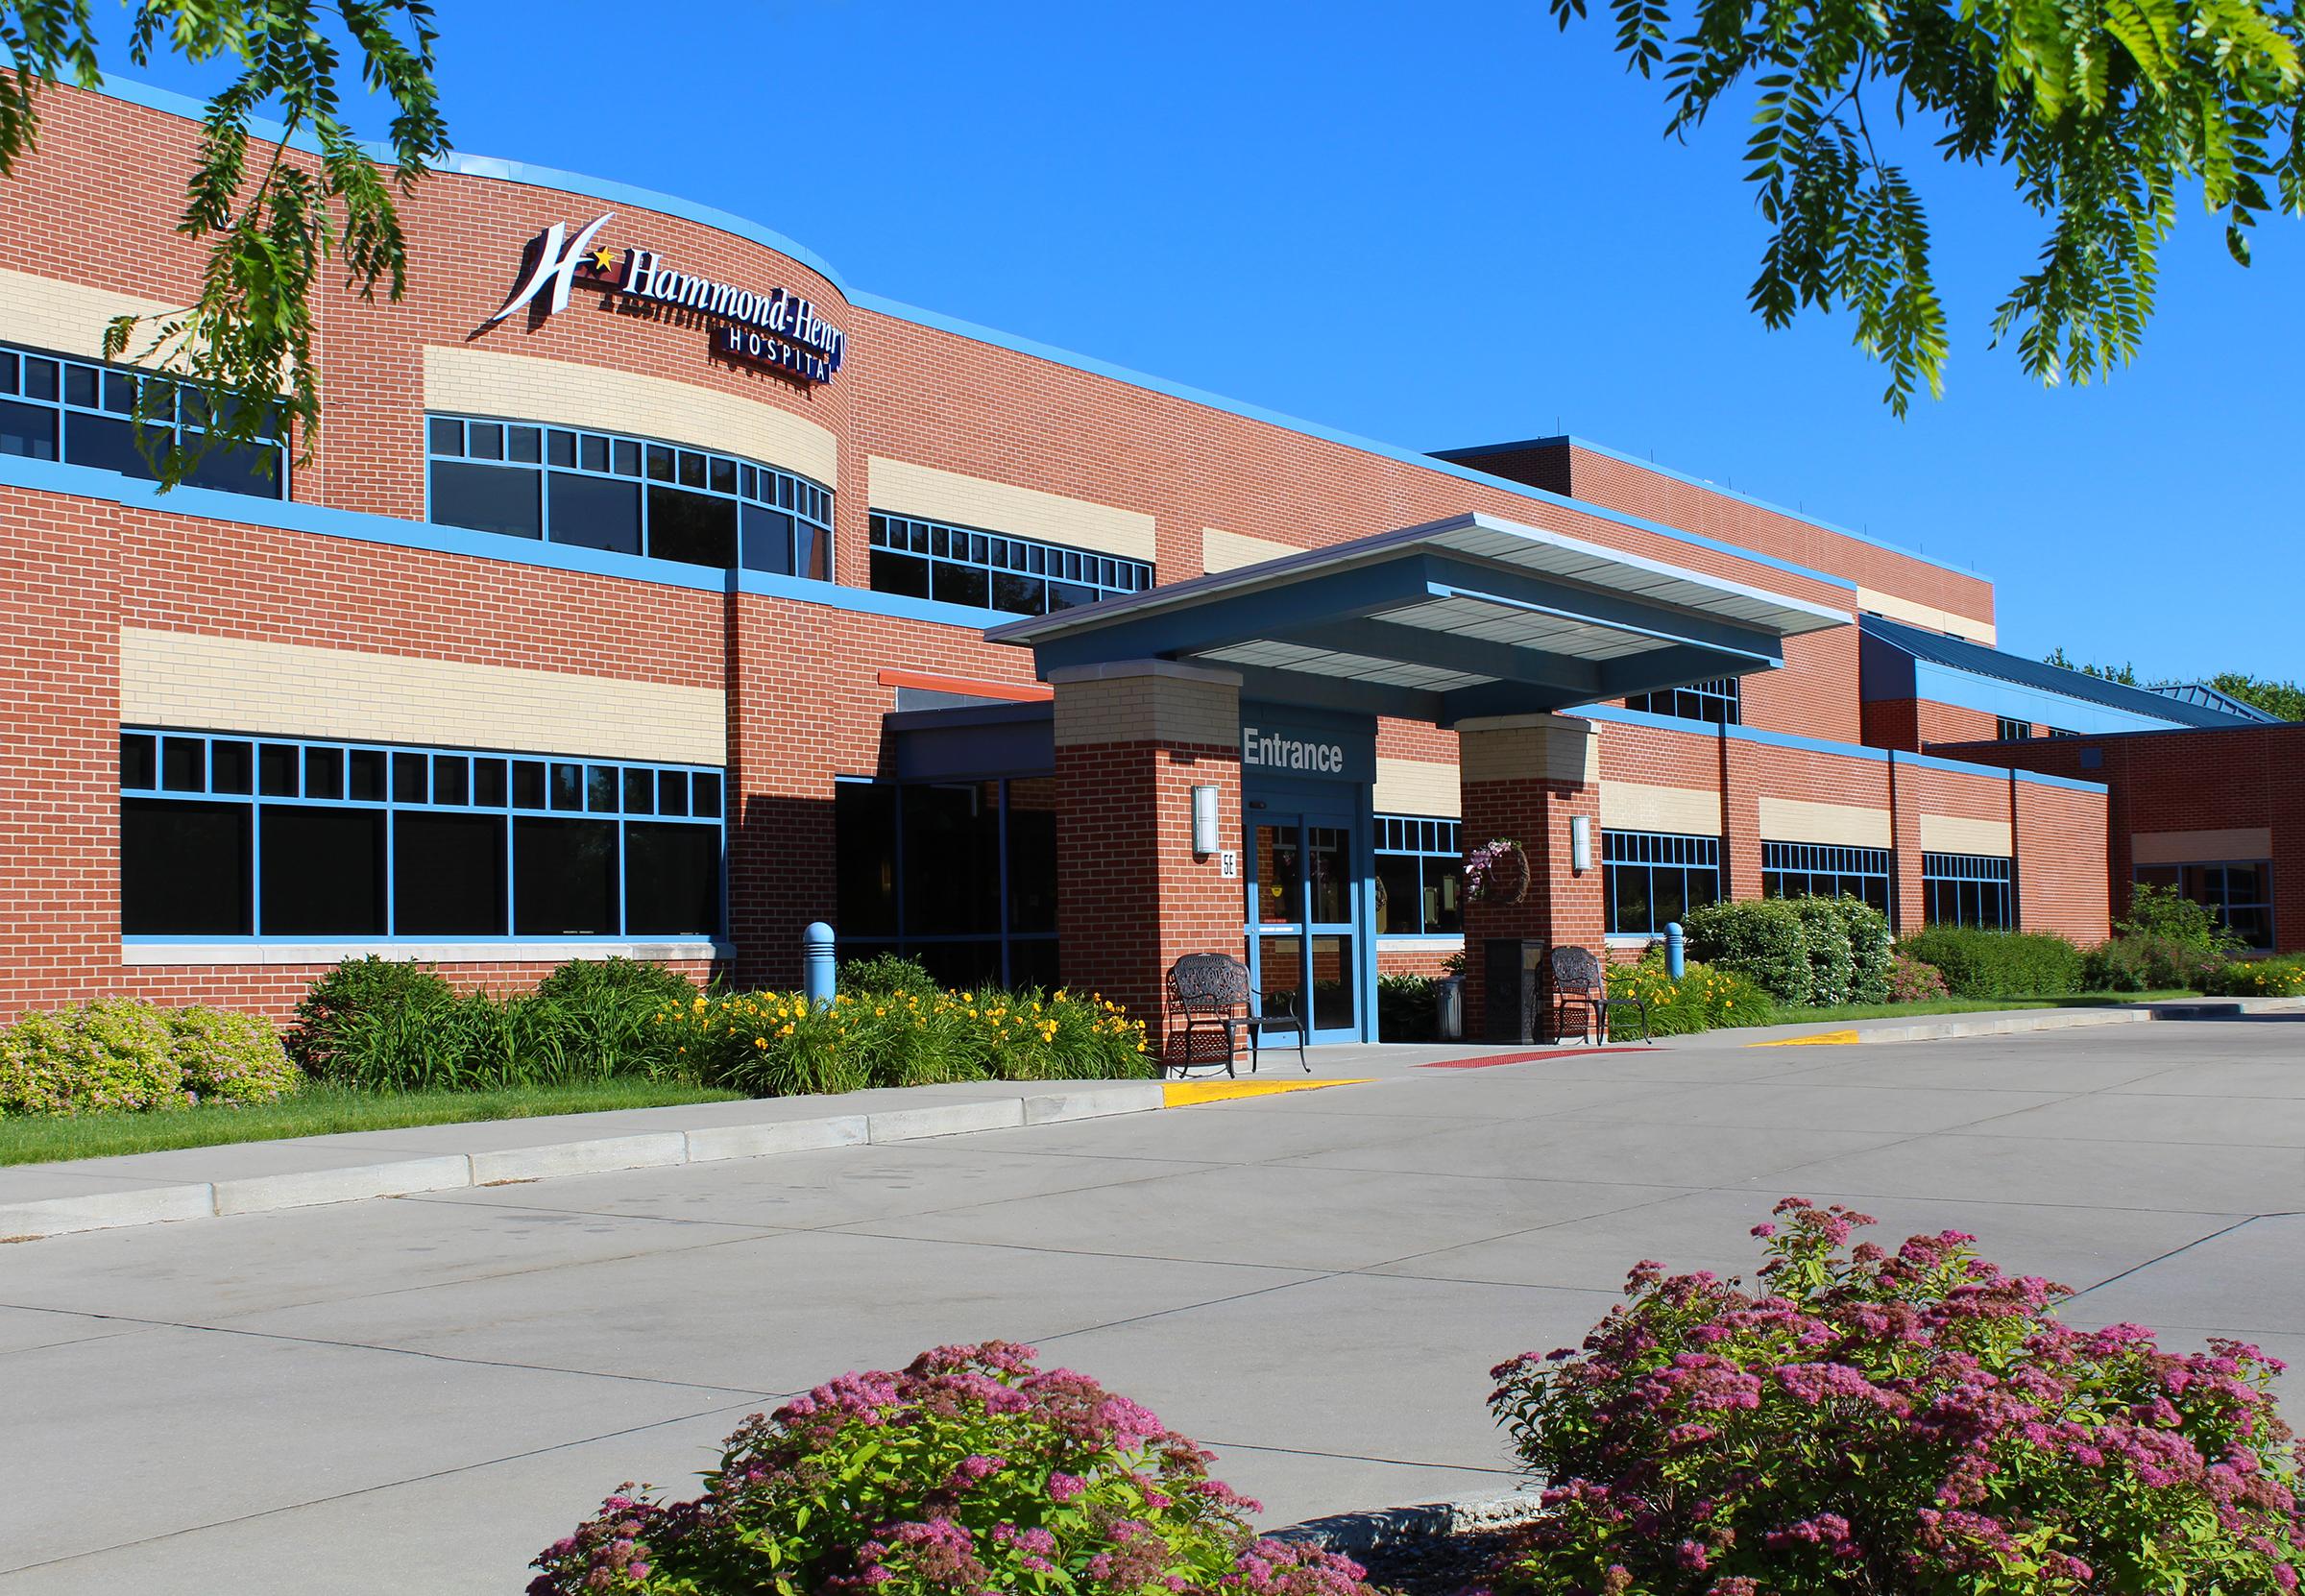 Hammond Hnery Hospital